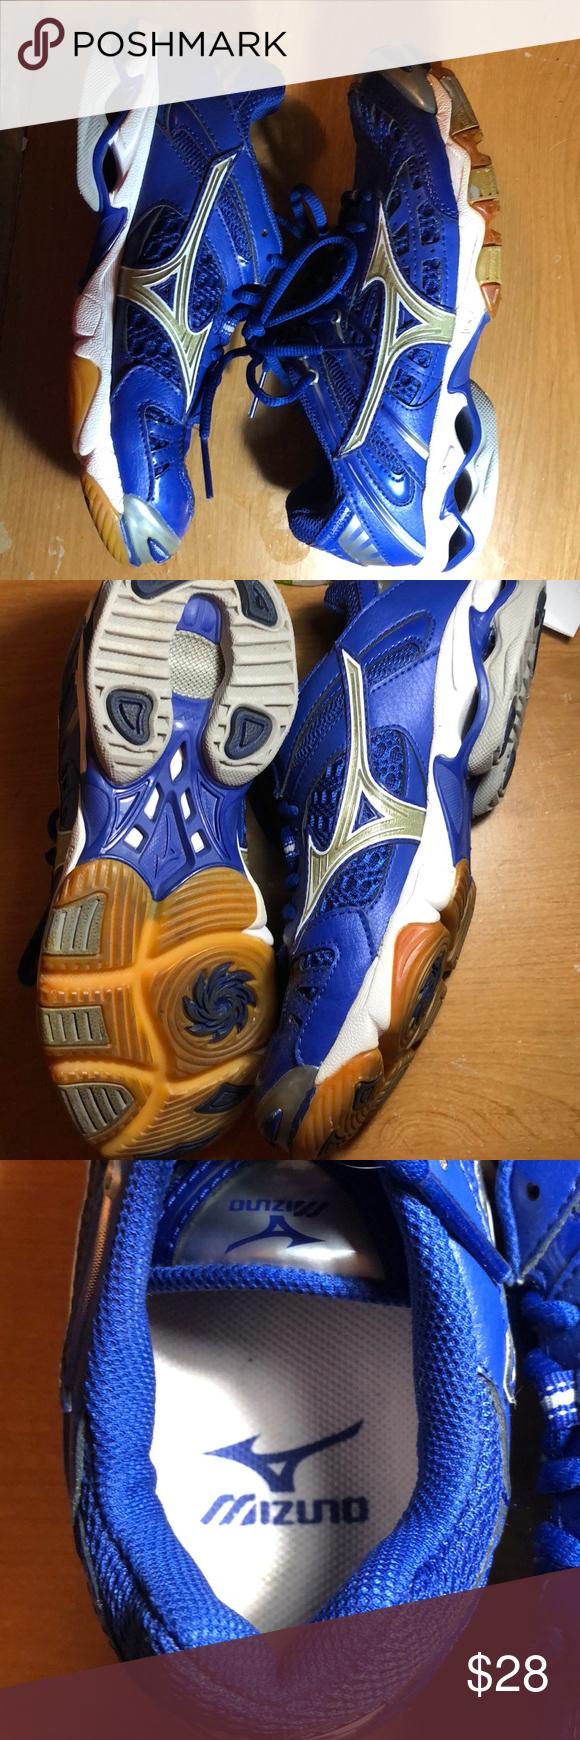 Mizuno Volleyball Shoes Volleyball Shoes Mizuno Volleyball Mizuno Shoes